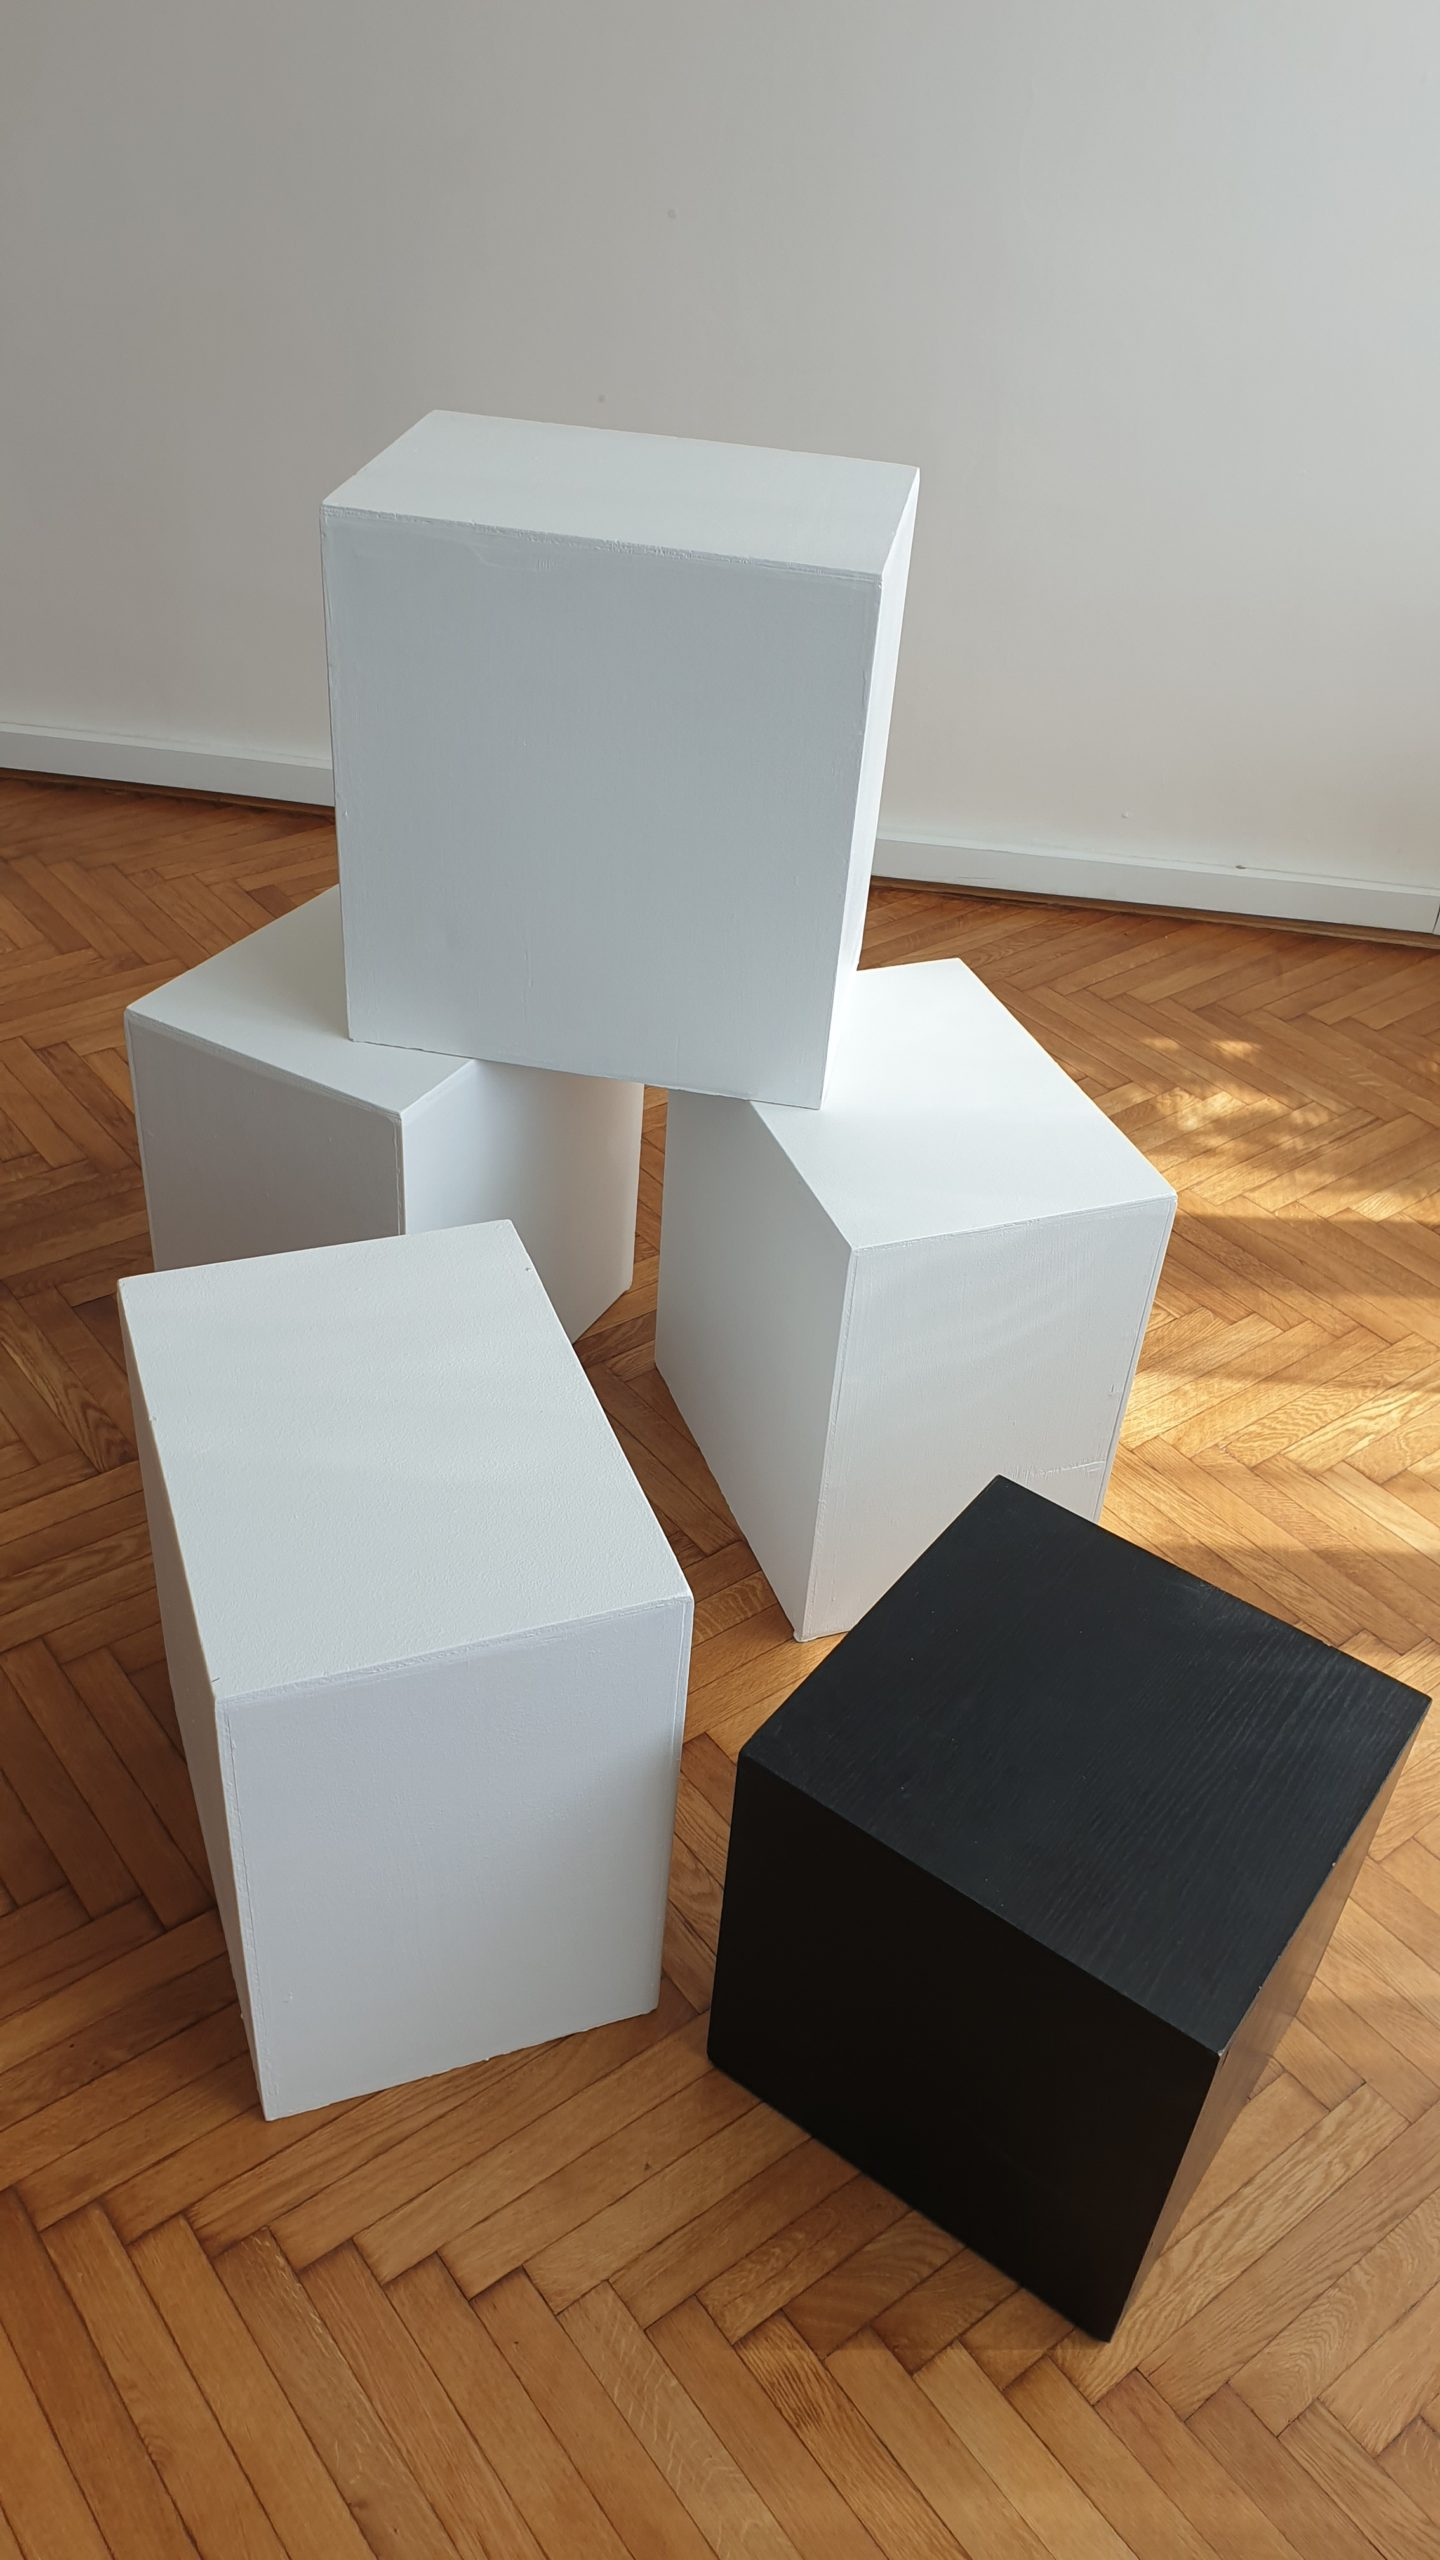 Posing Blocks